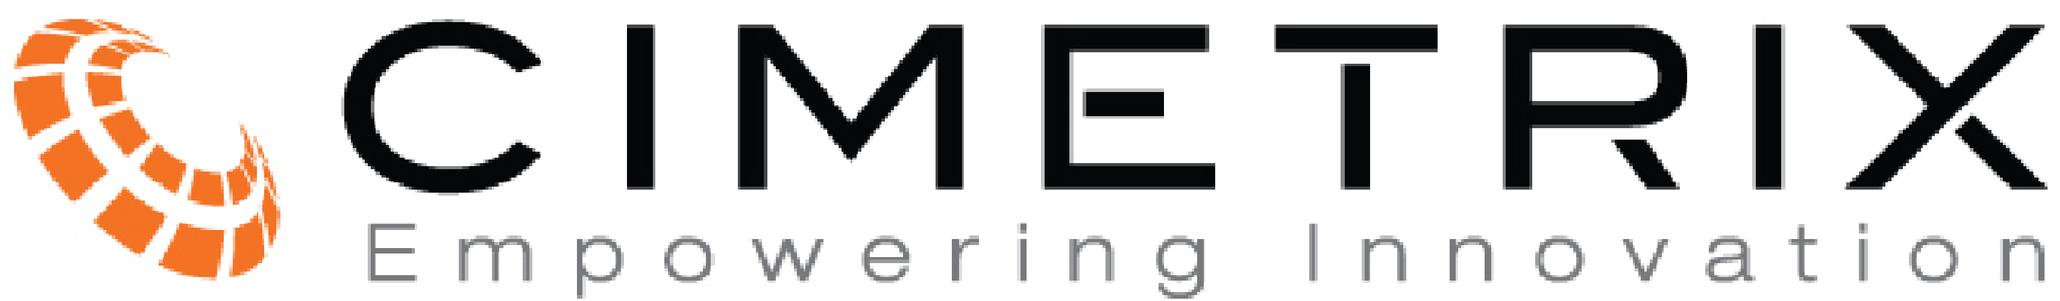 Copy of Cimetrix